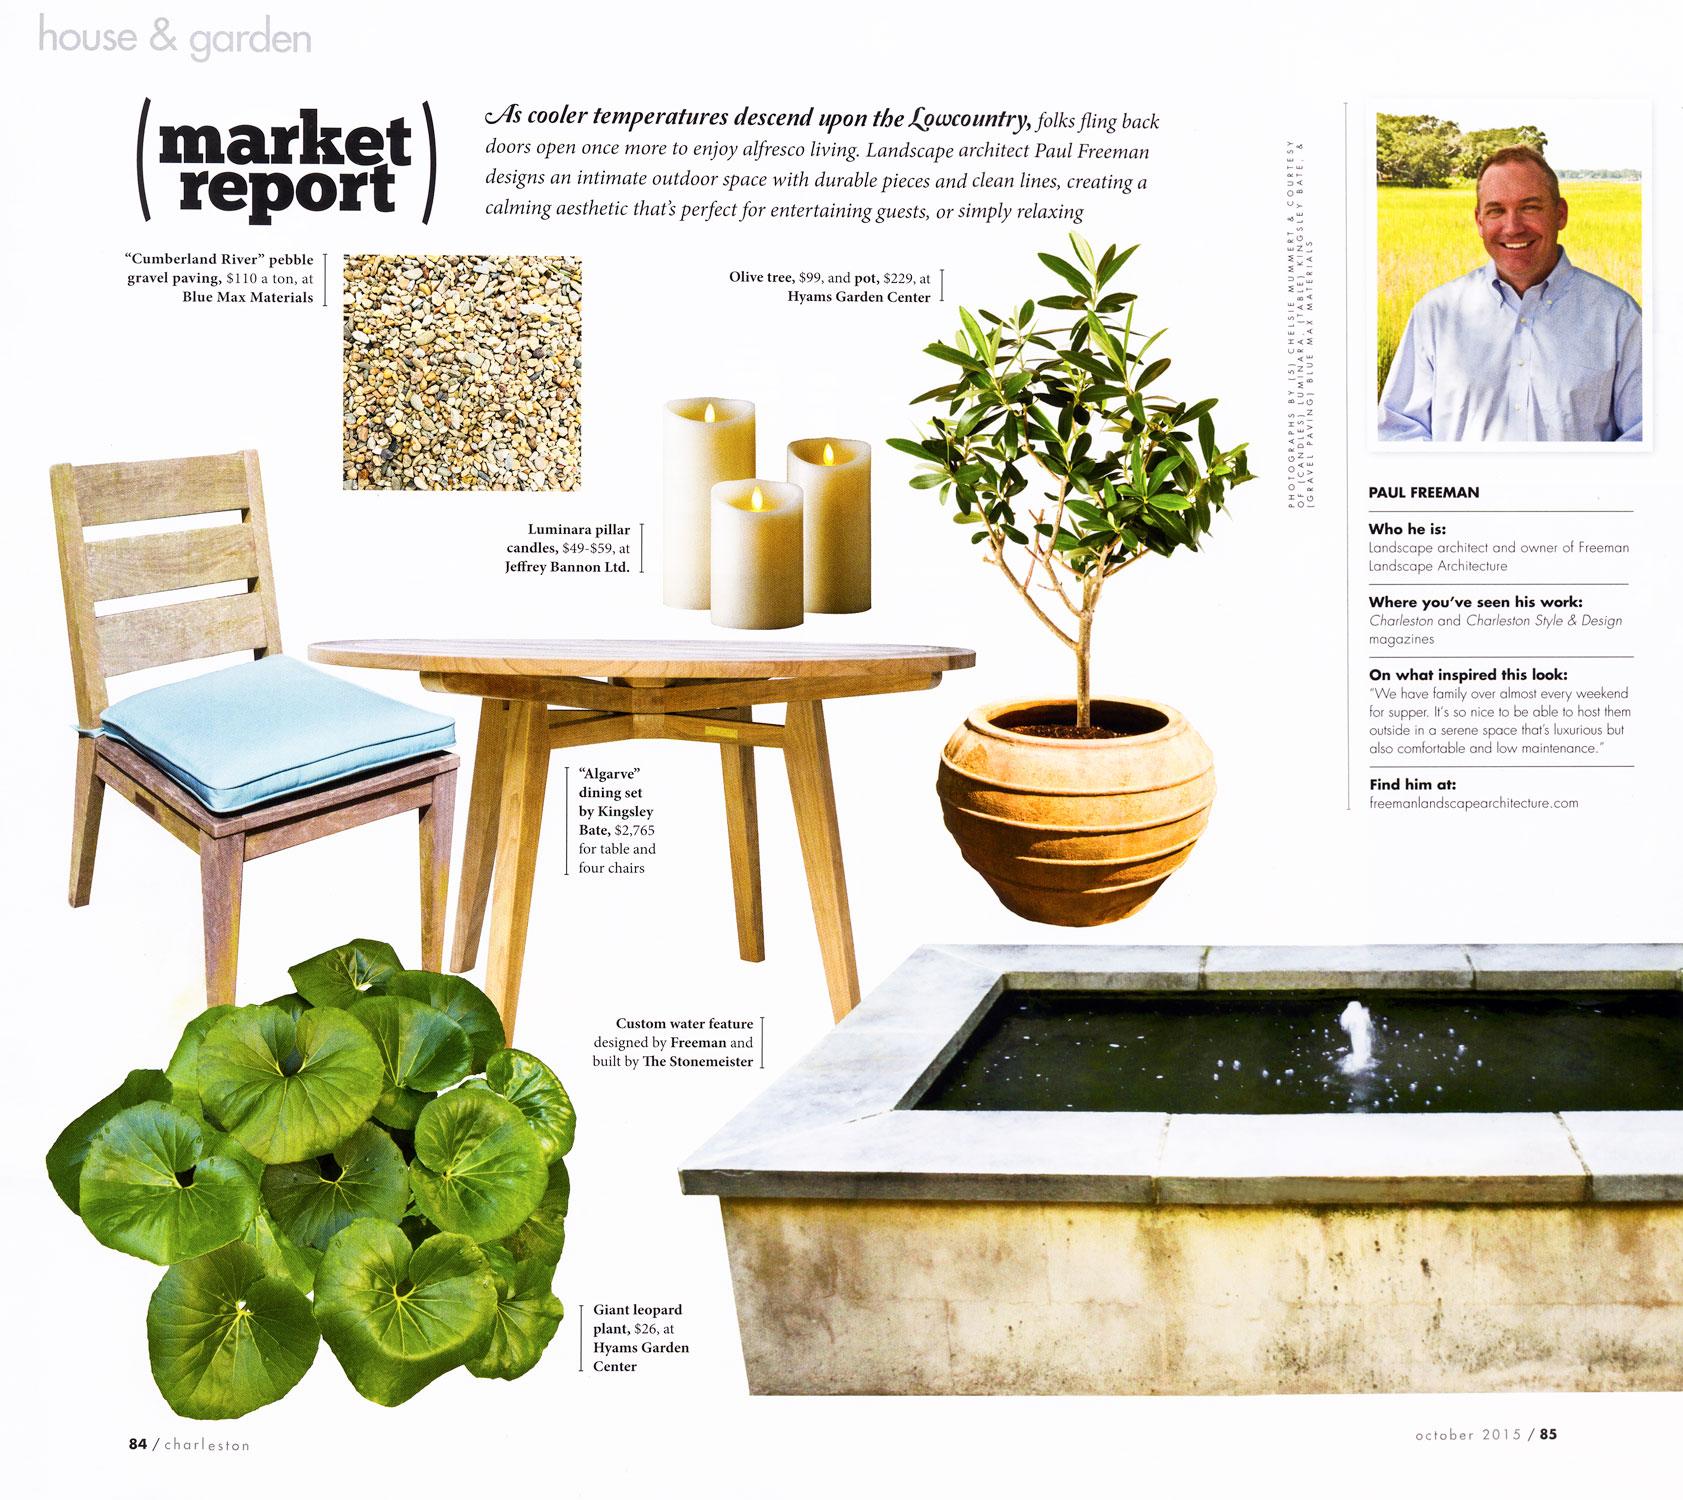 charleston-magazine-october-2015-84-85.jpg